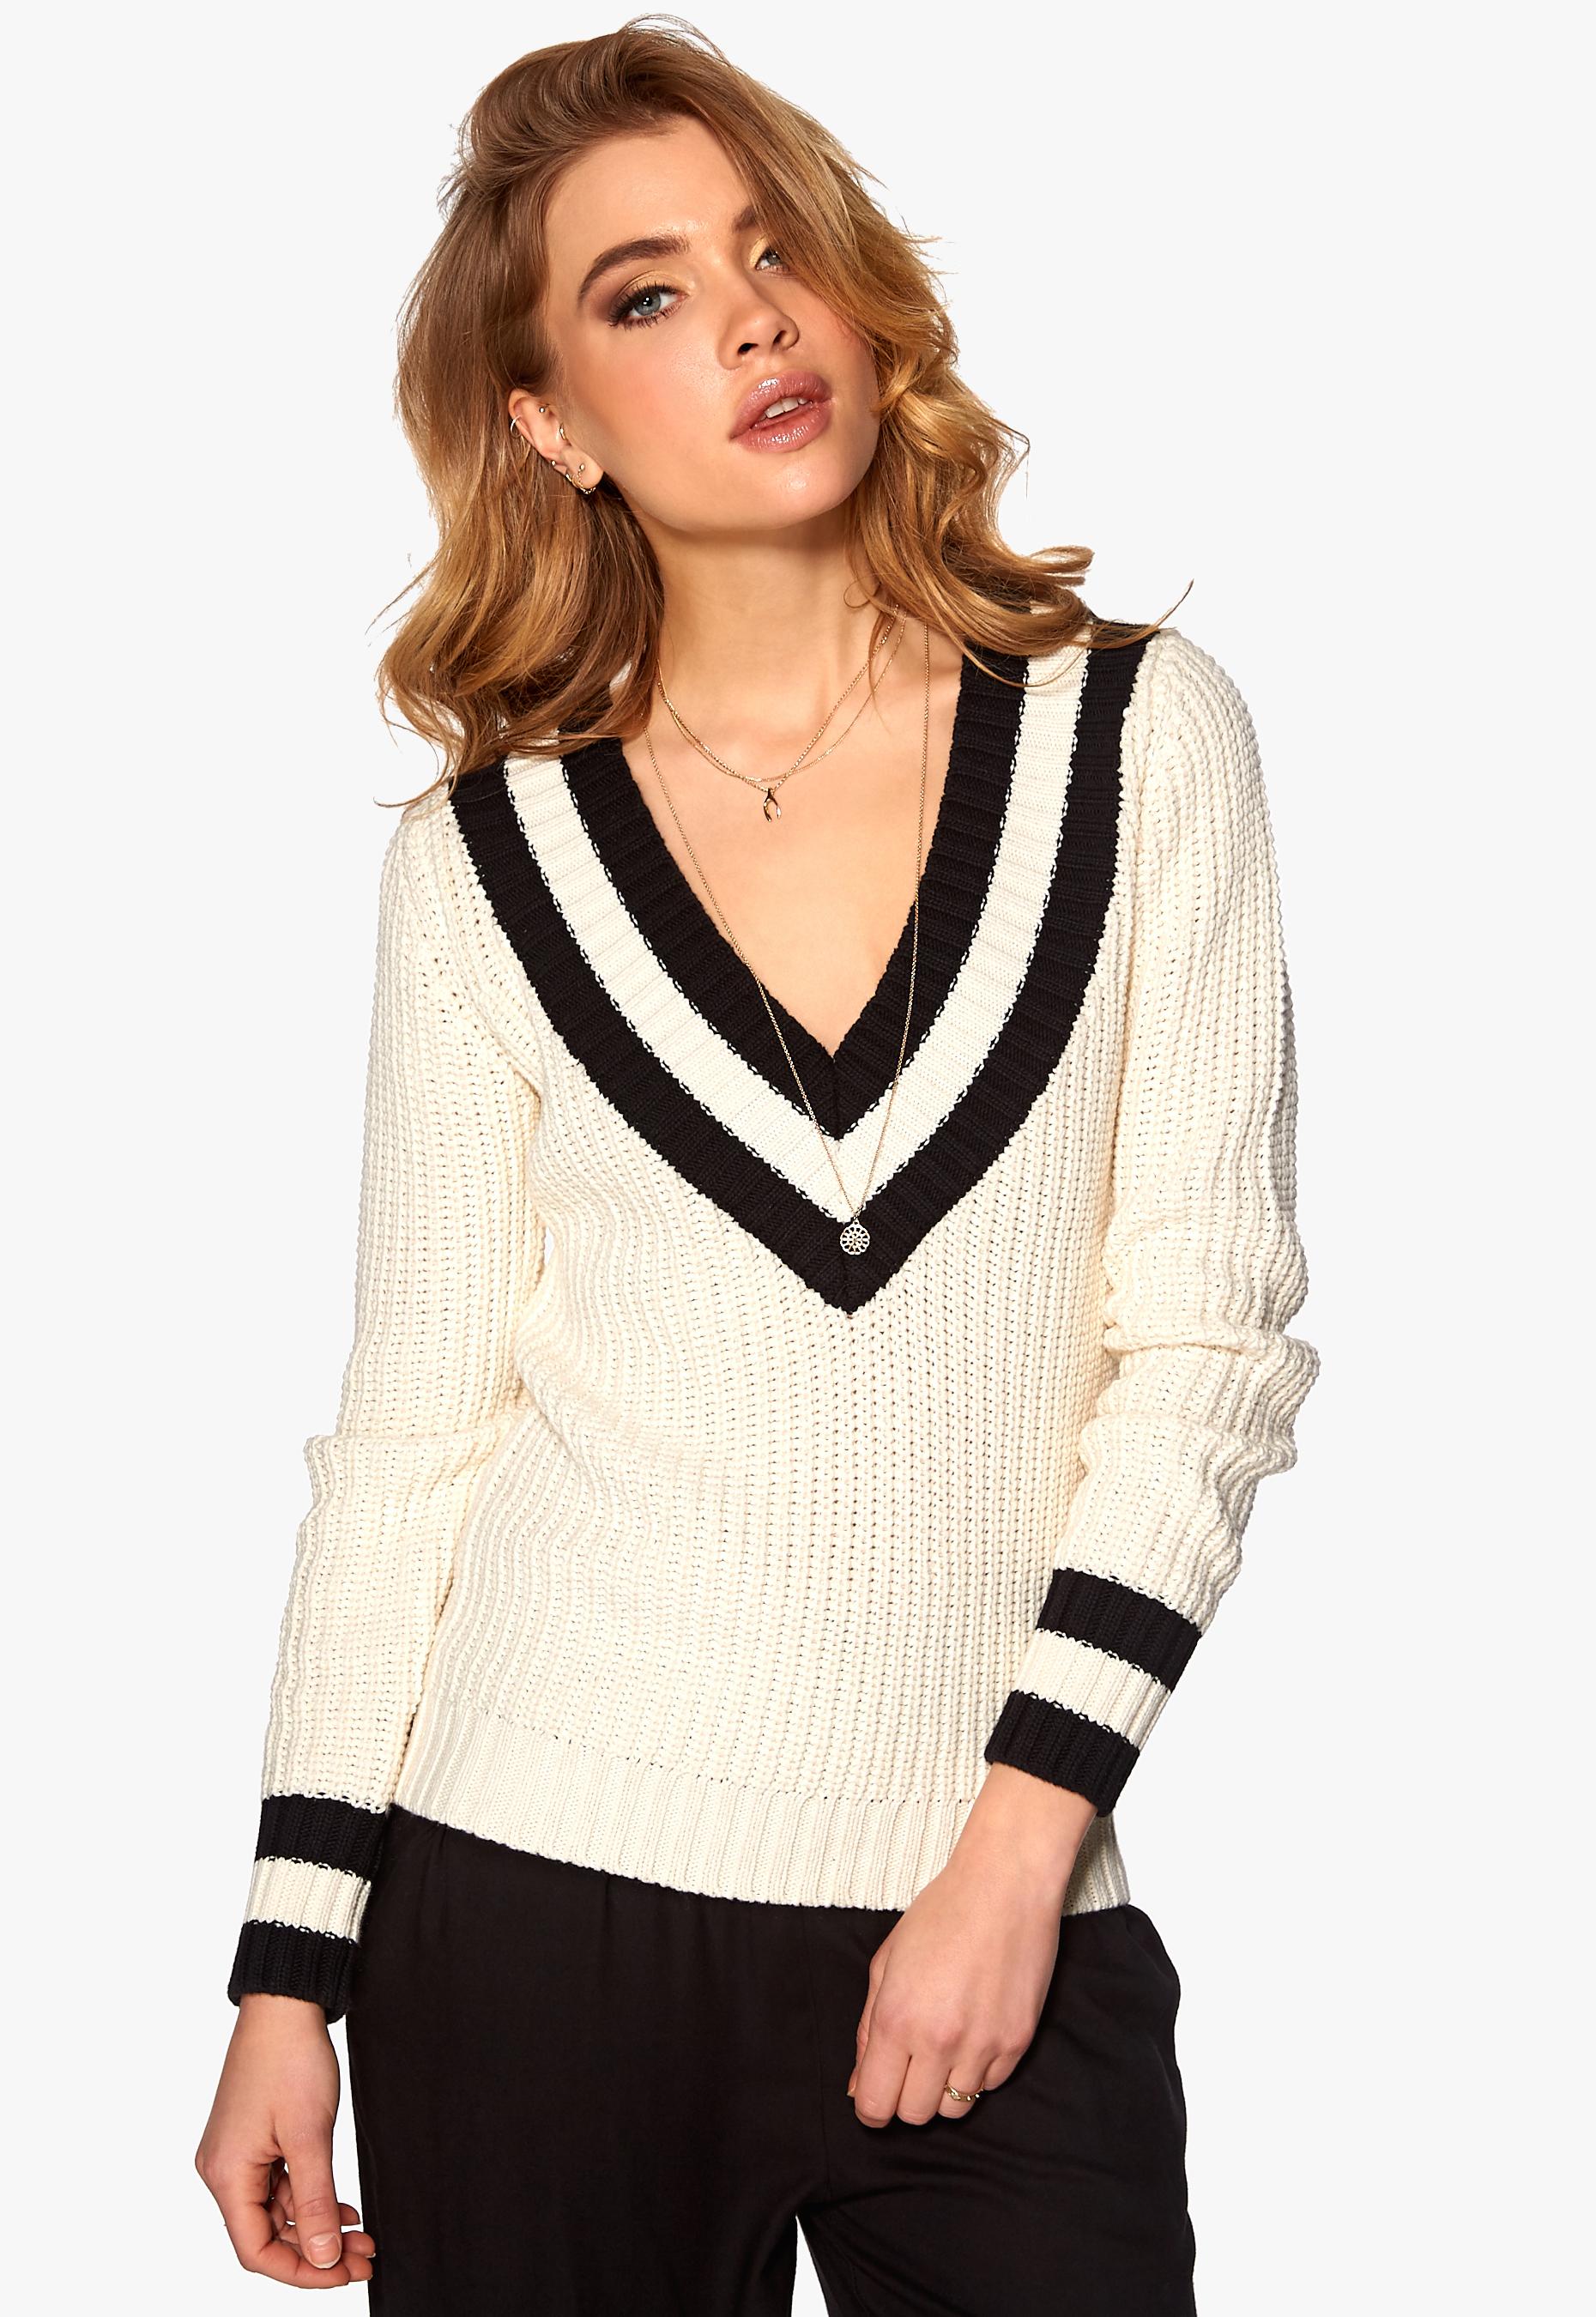 Kamille Knit Pullover, Object | Klær, Gensere, Mote